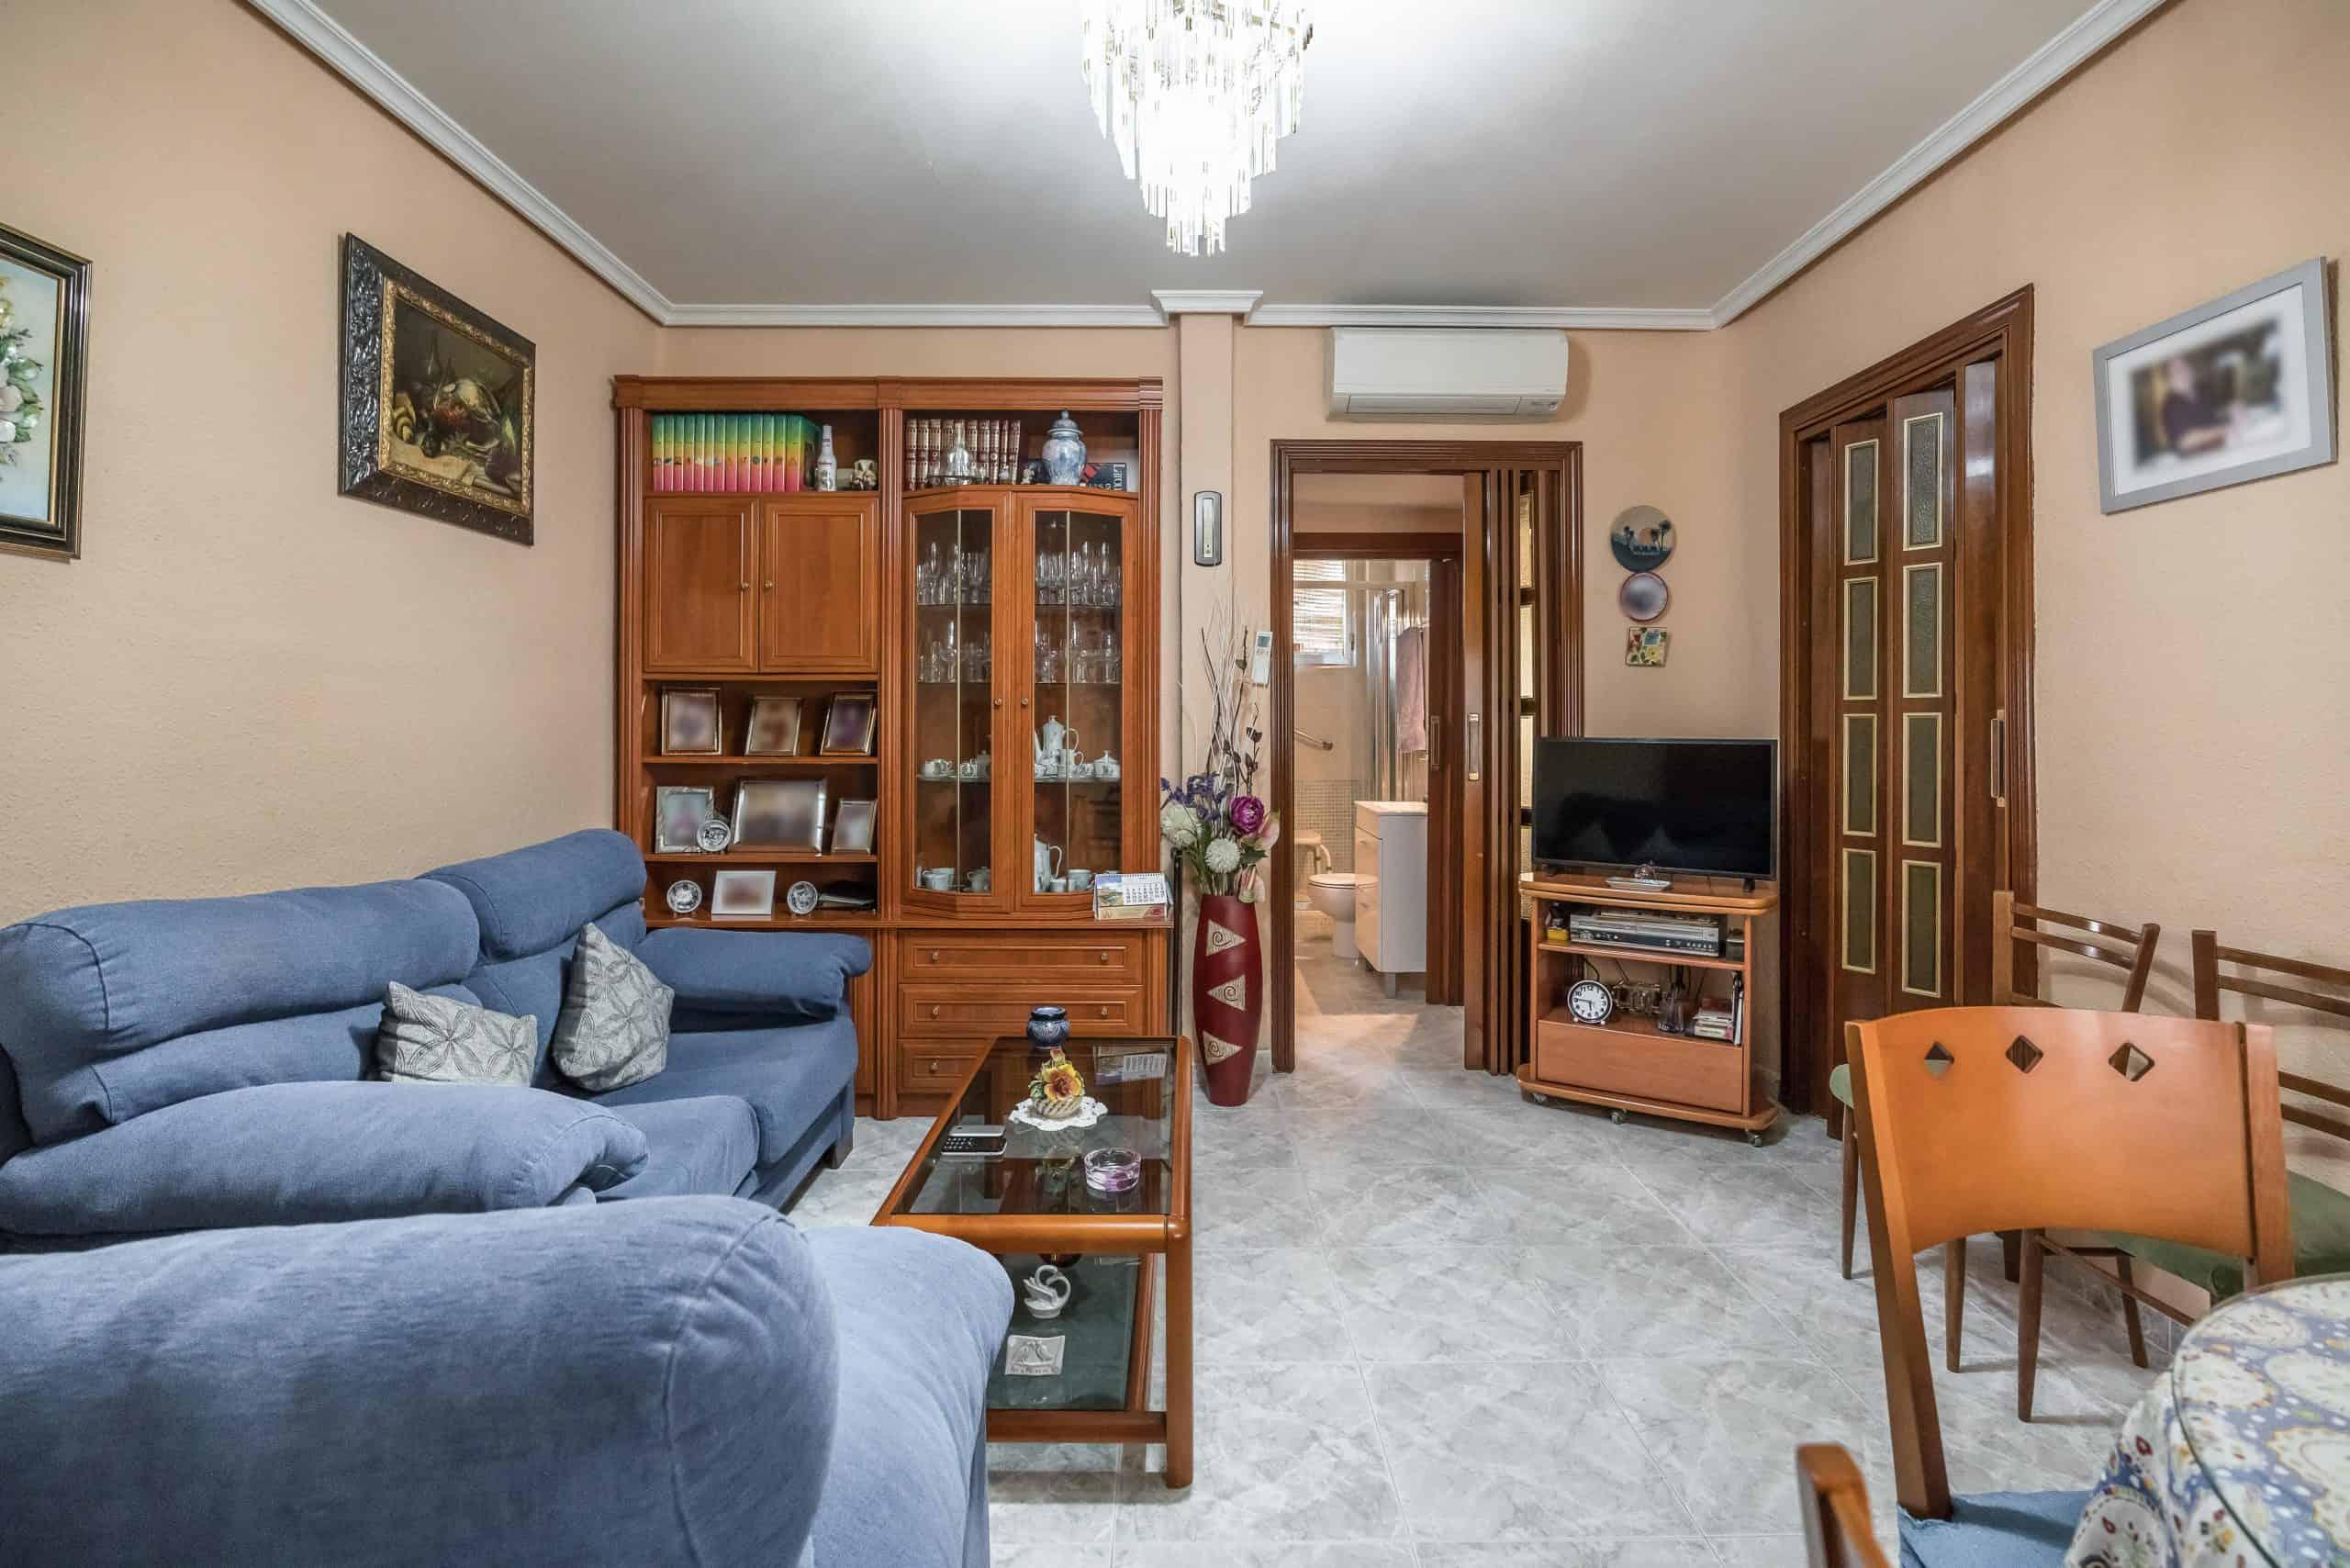 Agencia Inmobiliaria de Madrid-FUTUROCASA-Zona ARGANZUELA-EMBAJADORES-LEGAZPI1 SALON (13)